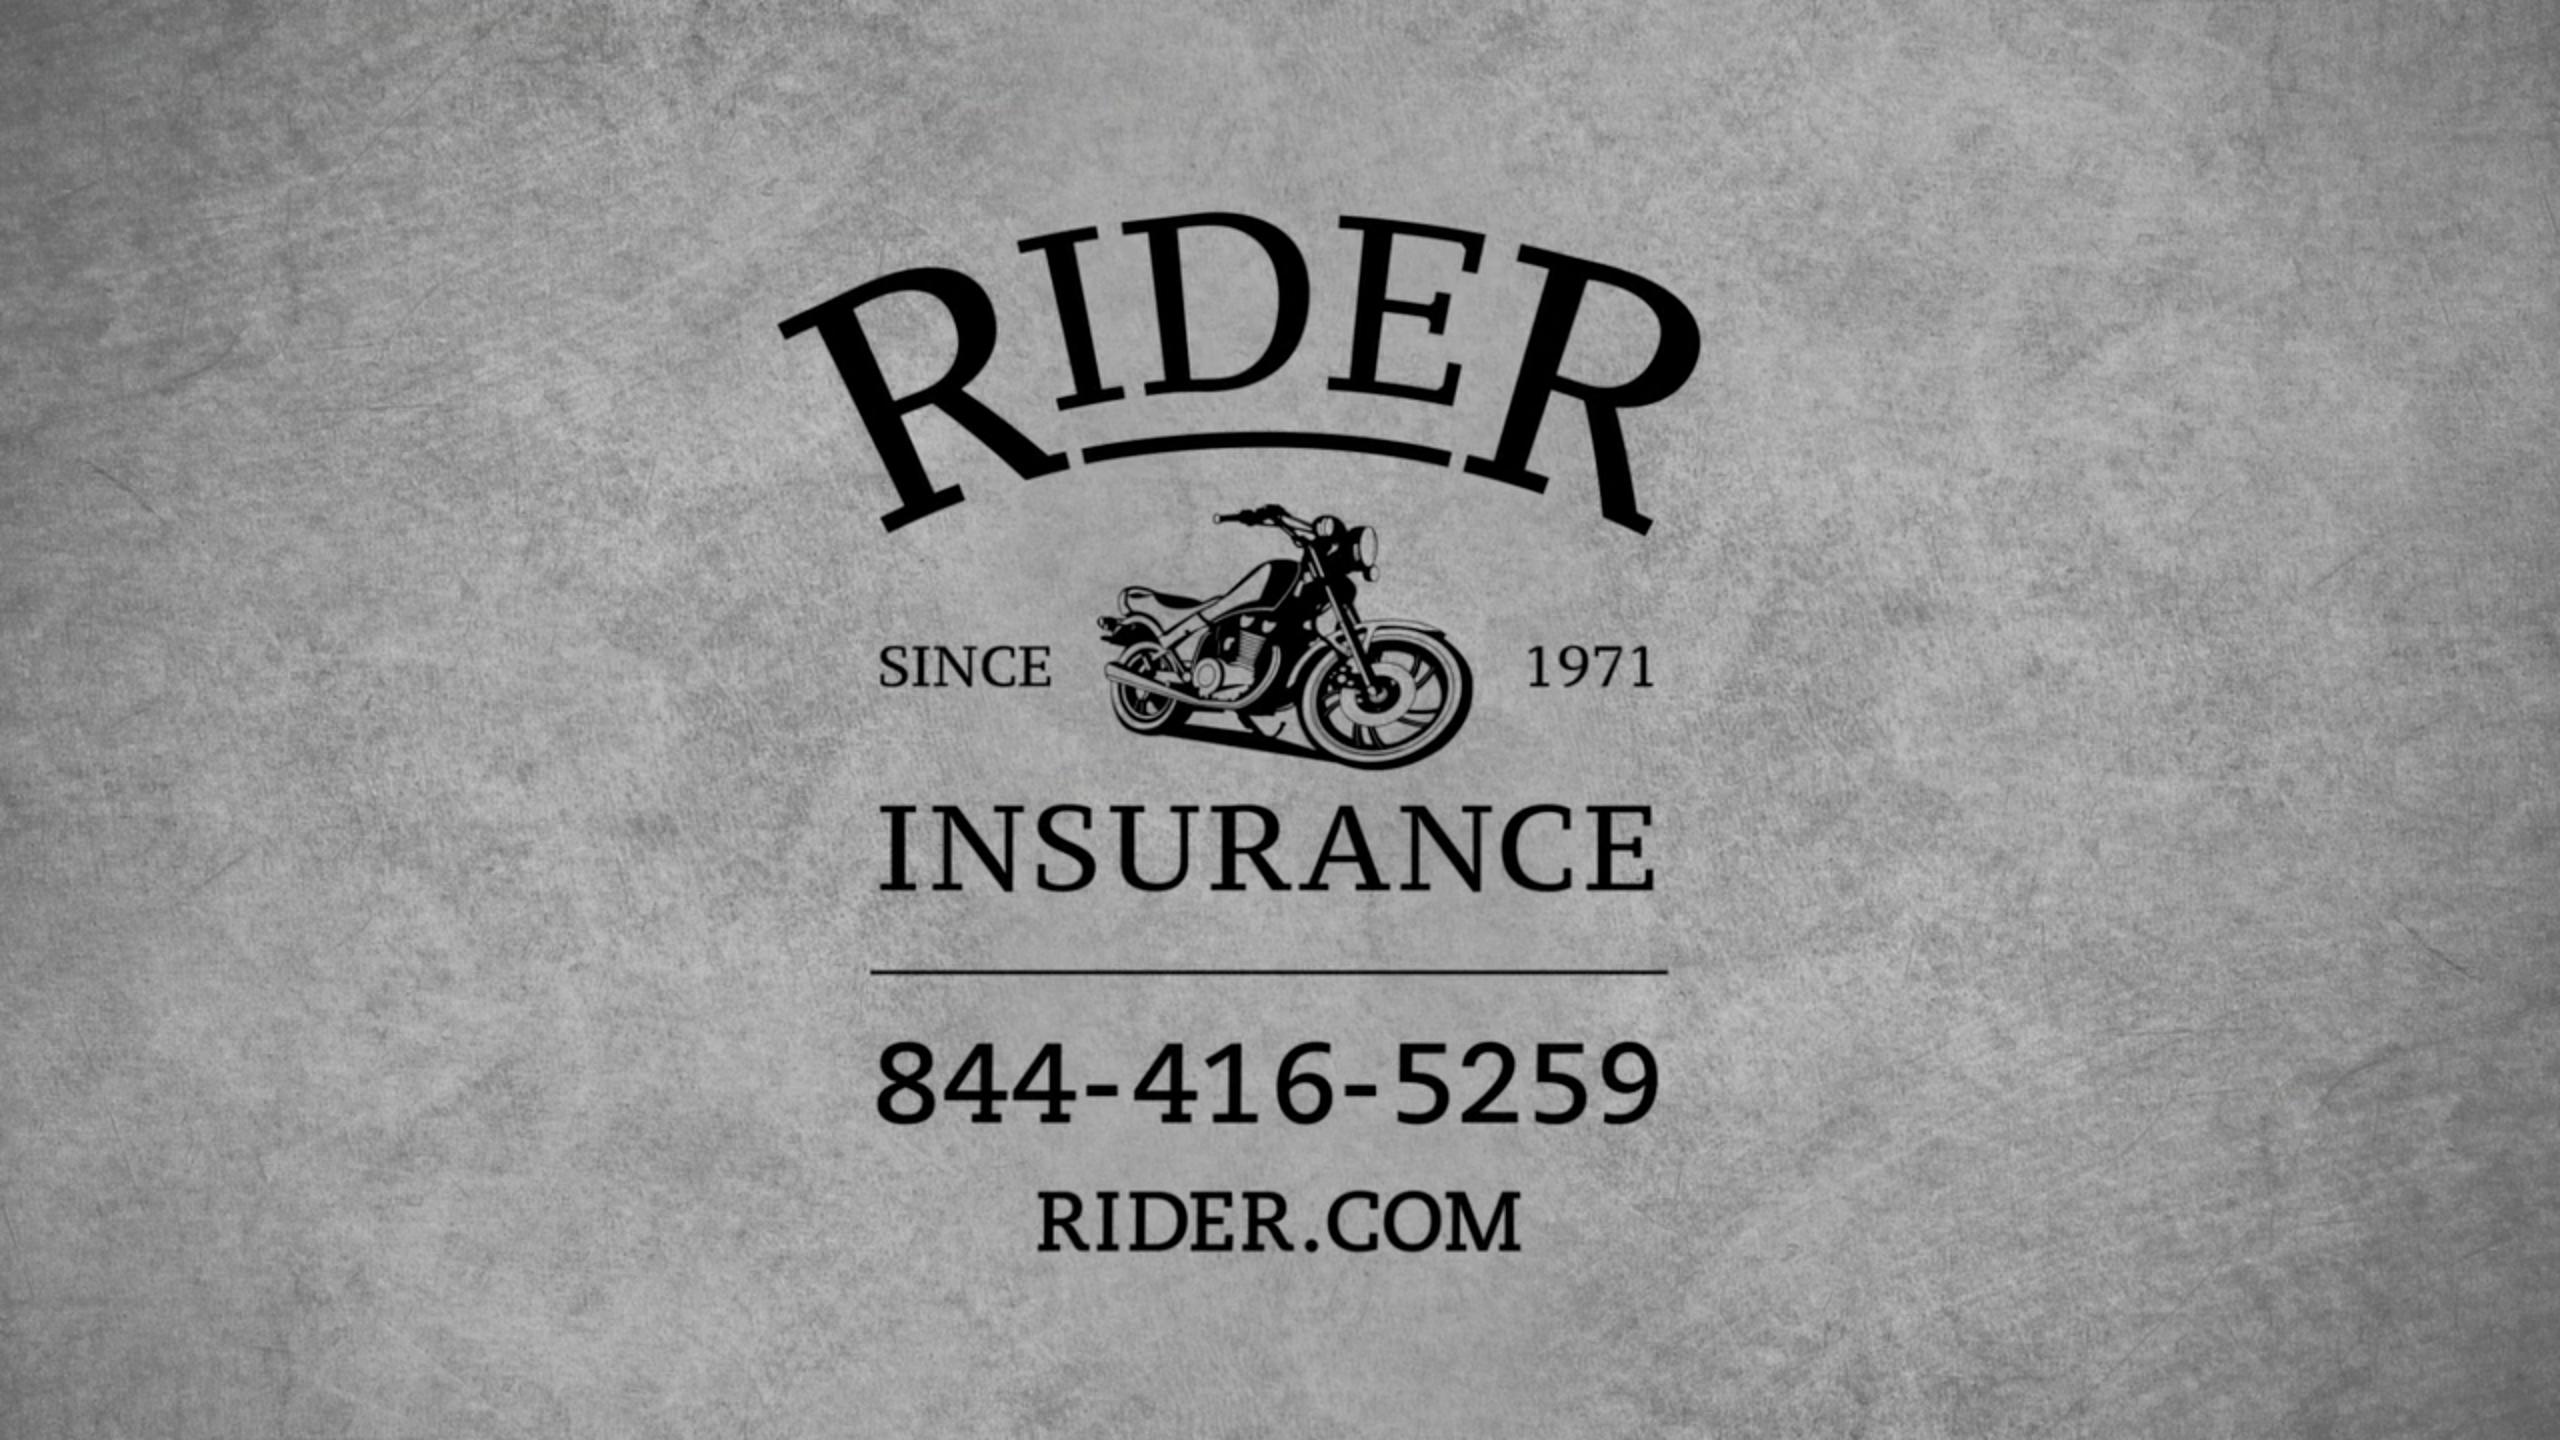 Rider Insurance 'We Get It' Spot // The CSI Group